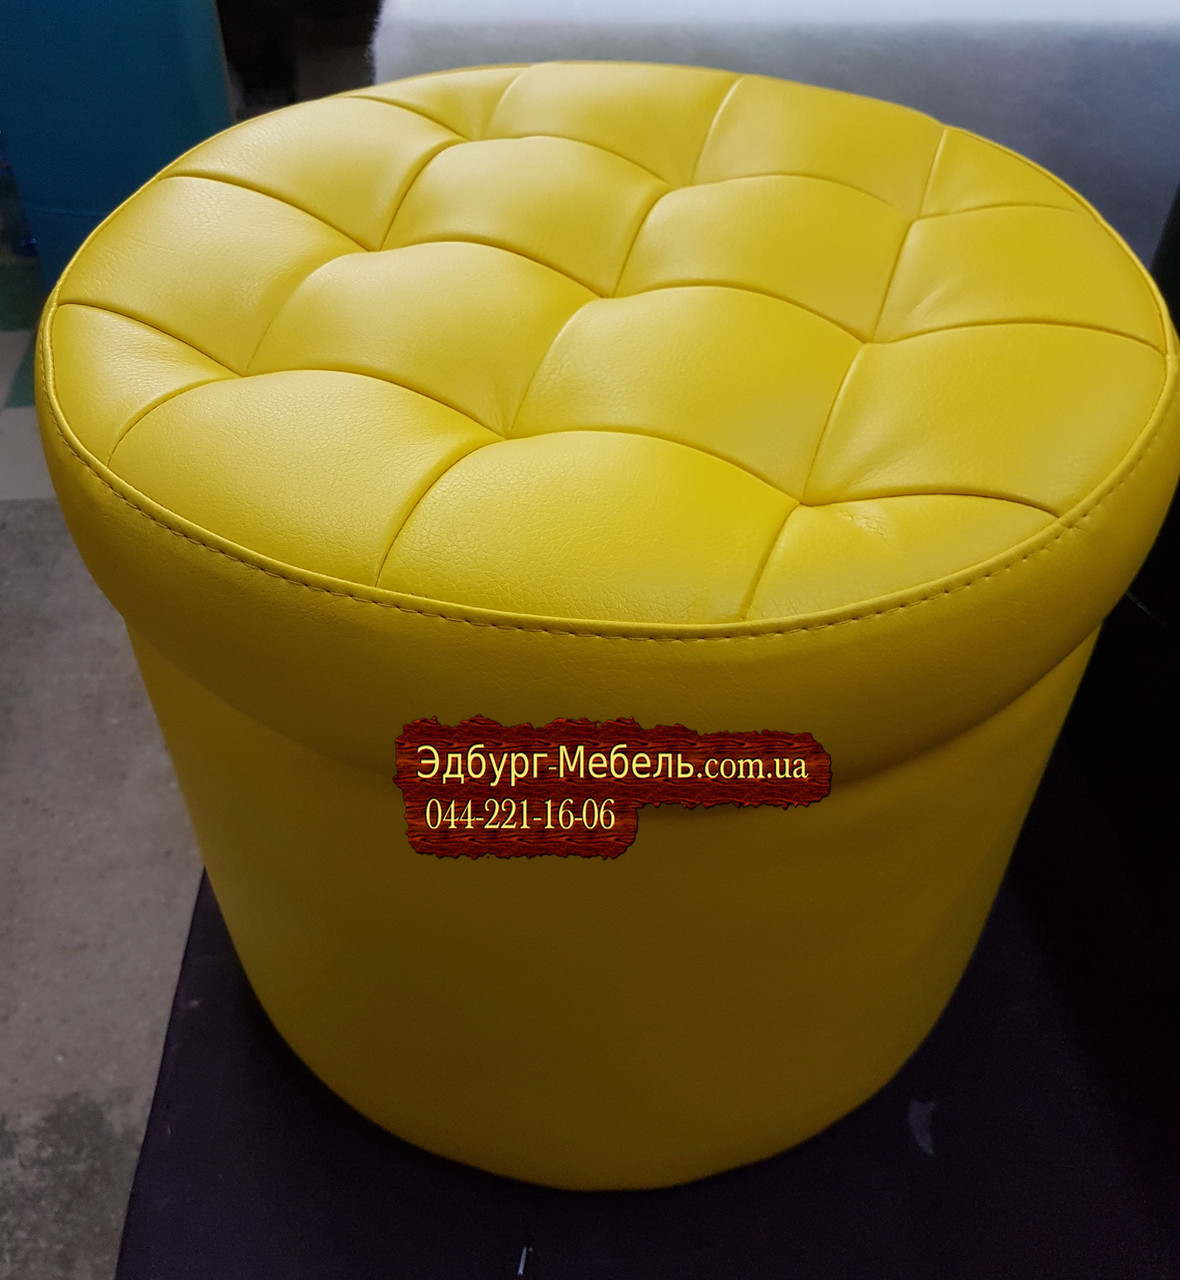 Круглый пуф желтого цвета